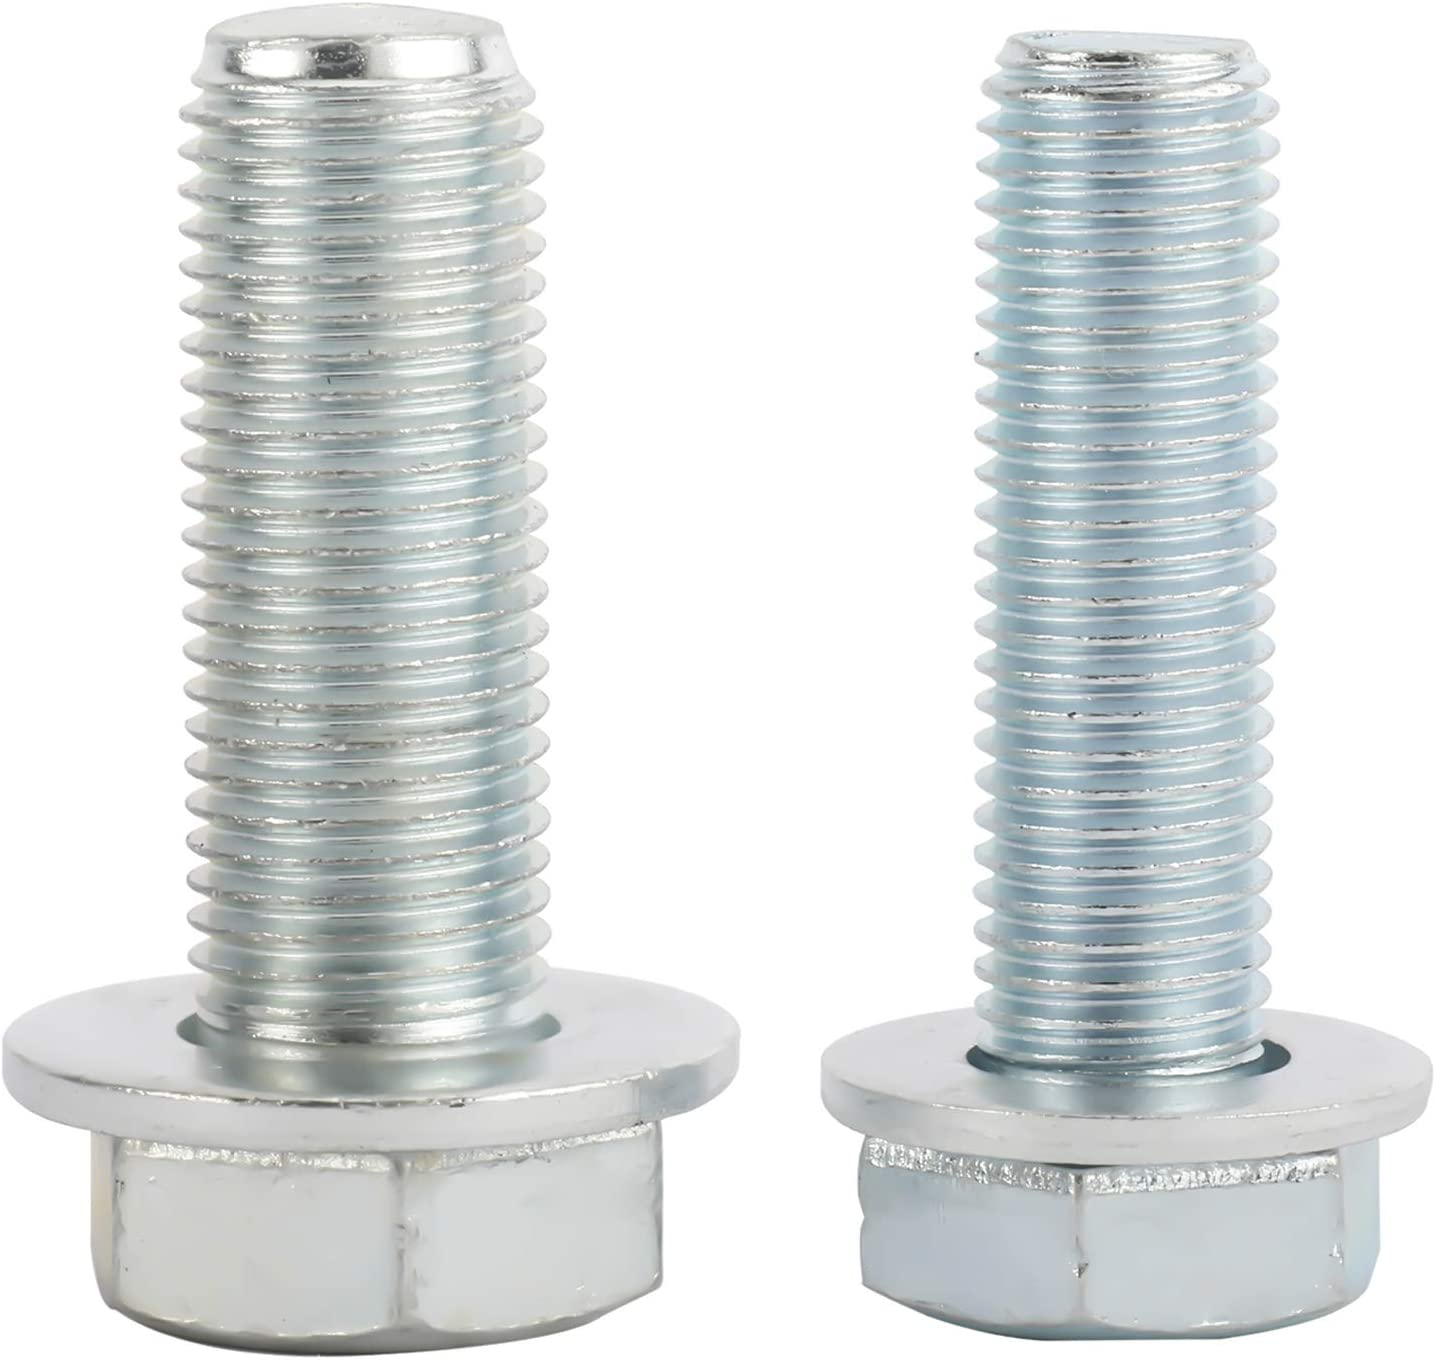 Replacement Parts NovelBee 3pcs Billet Aluminum 3-Bolt Engine ...